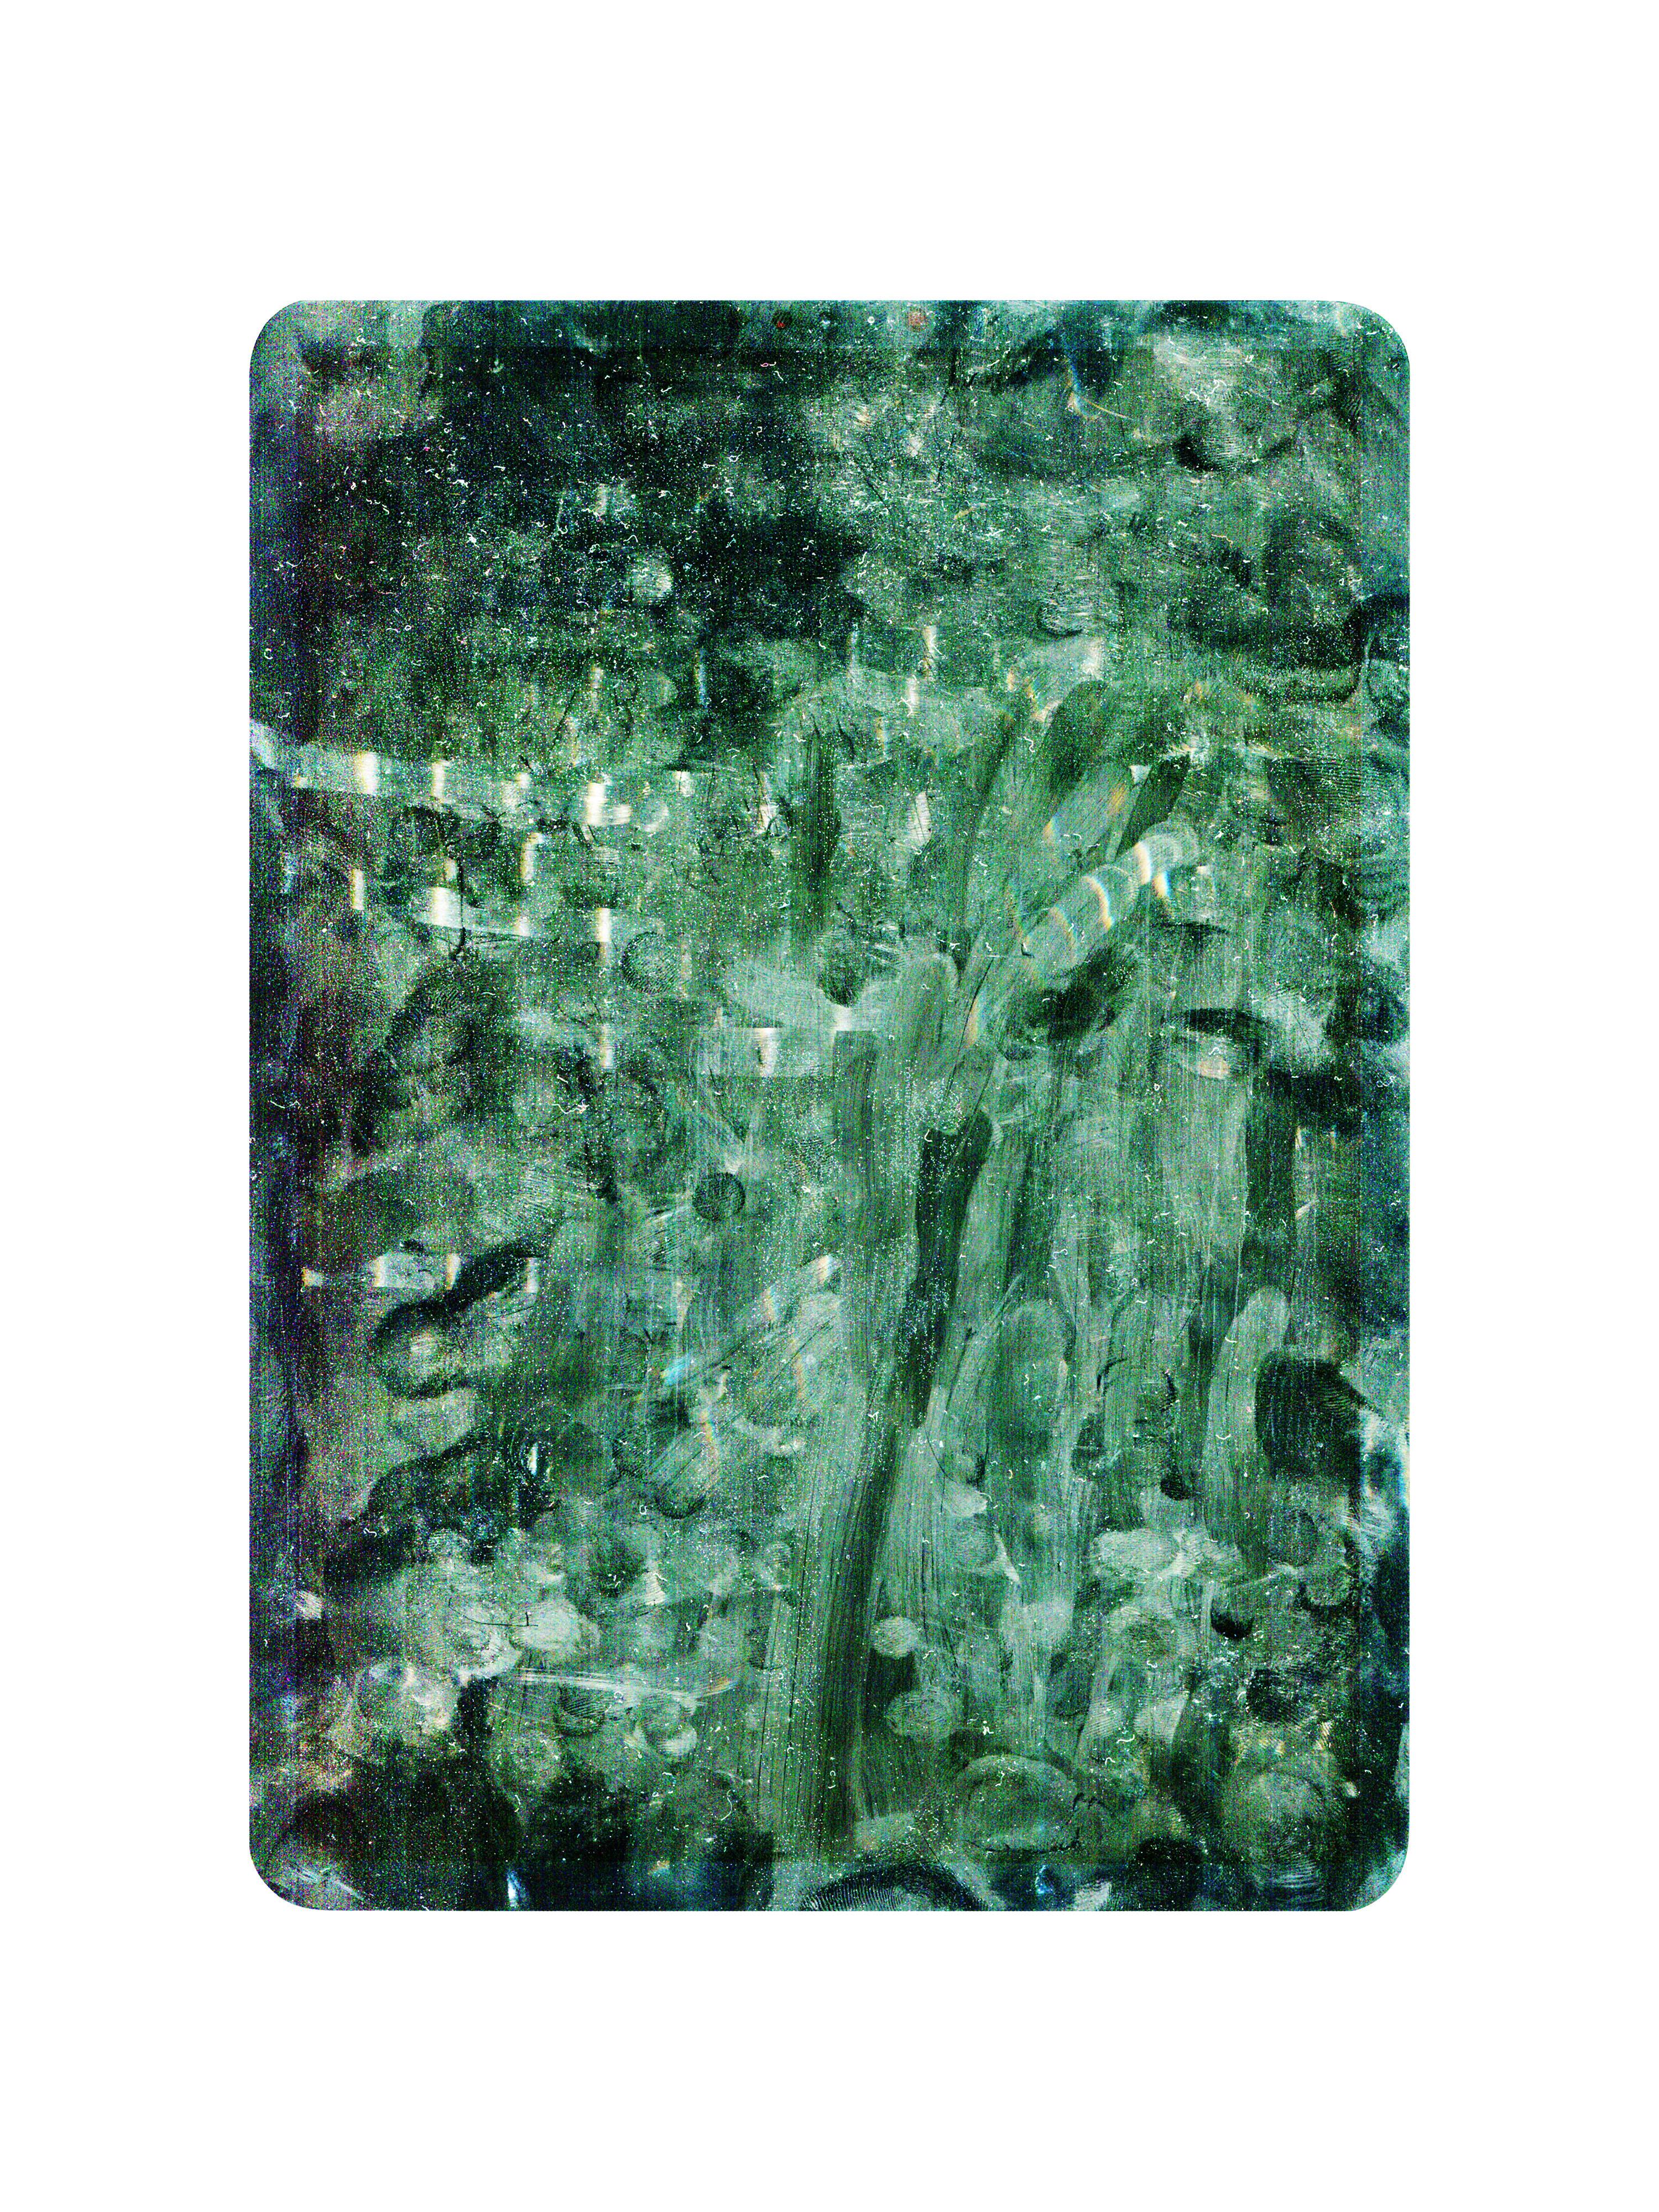 Tamiko Thiel, Touching,Traces_2020-04-06c, fine art print, 30 cm x 40 cm on Hahnemühle Baryta paper, 2020